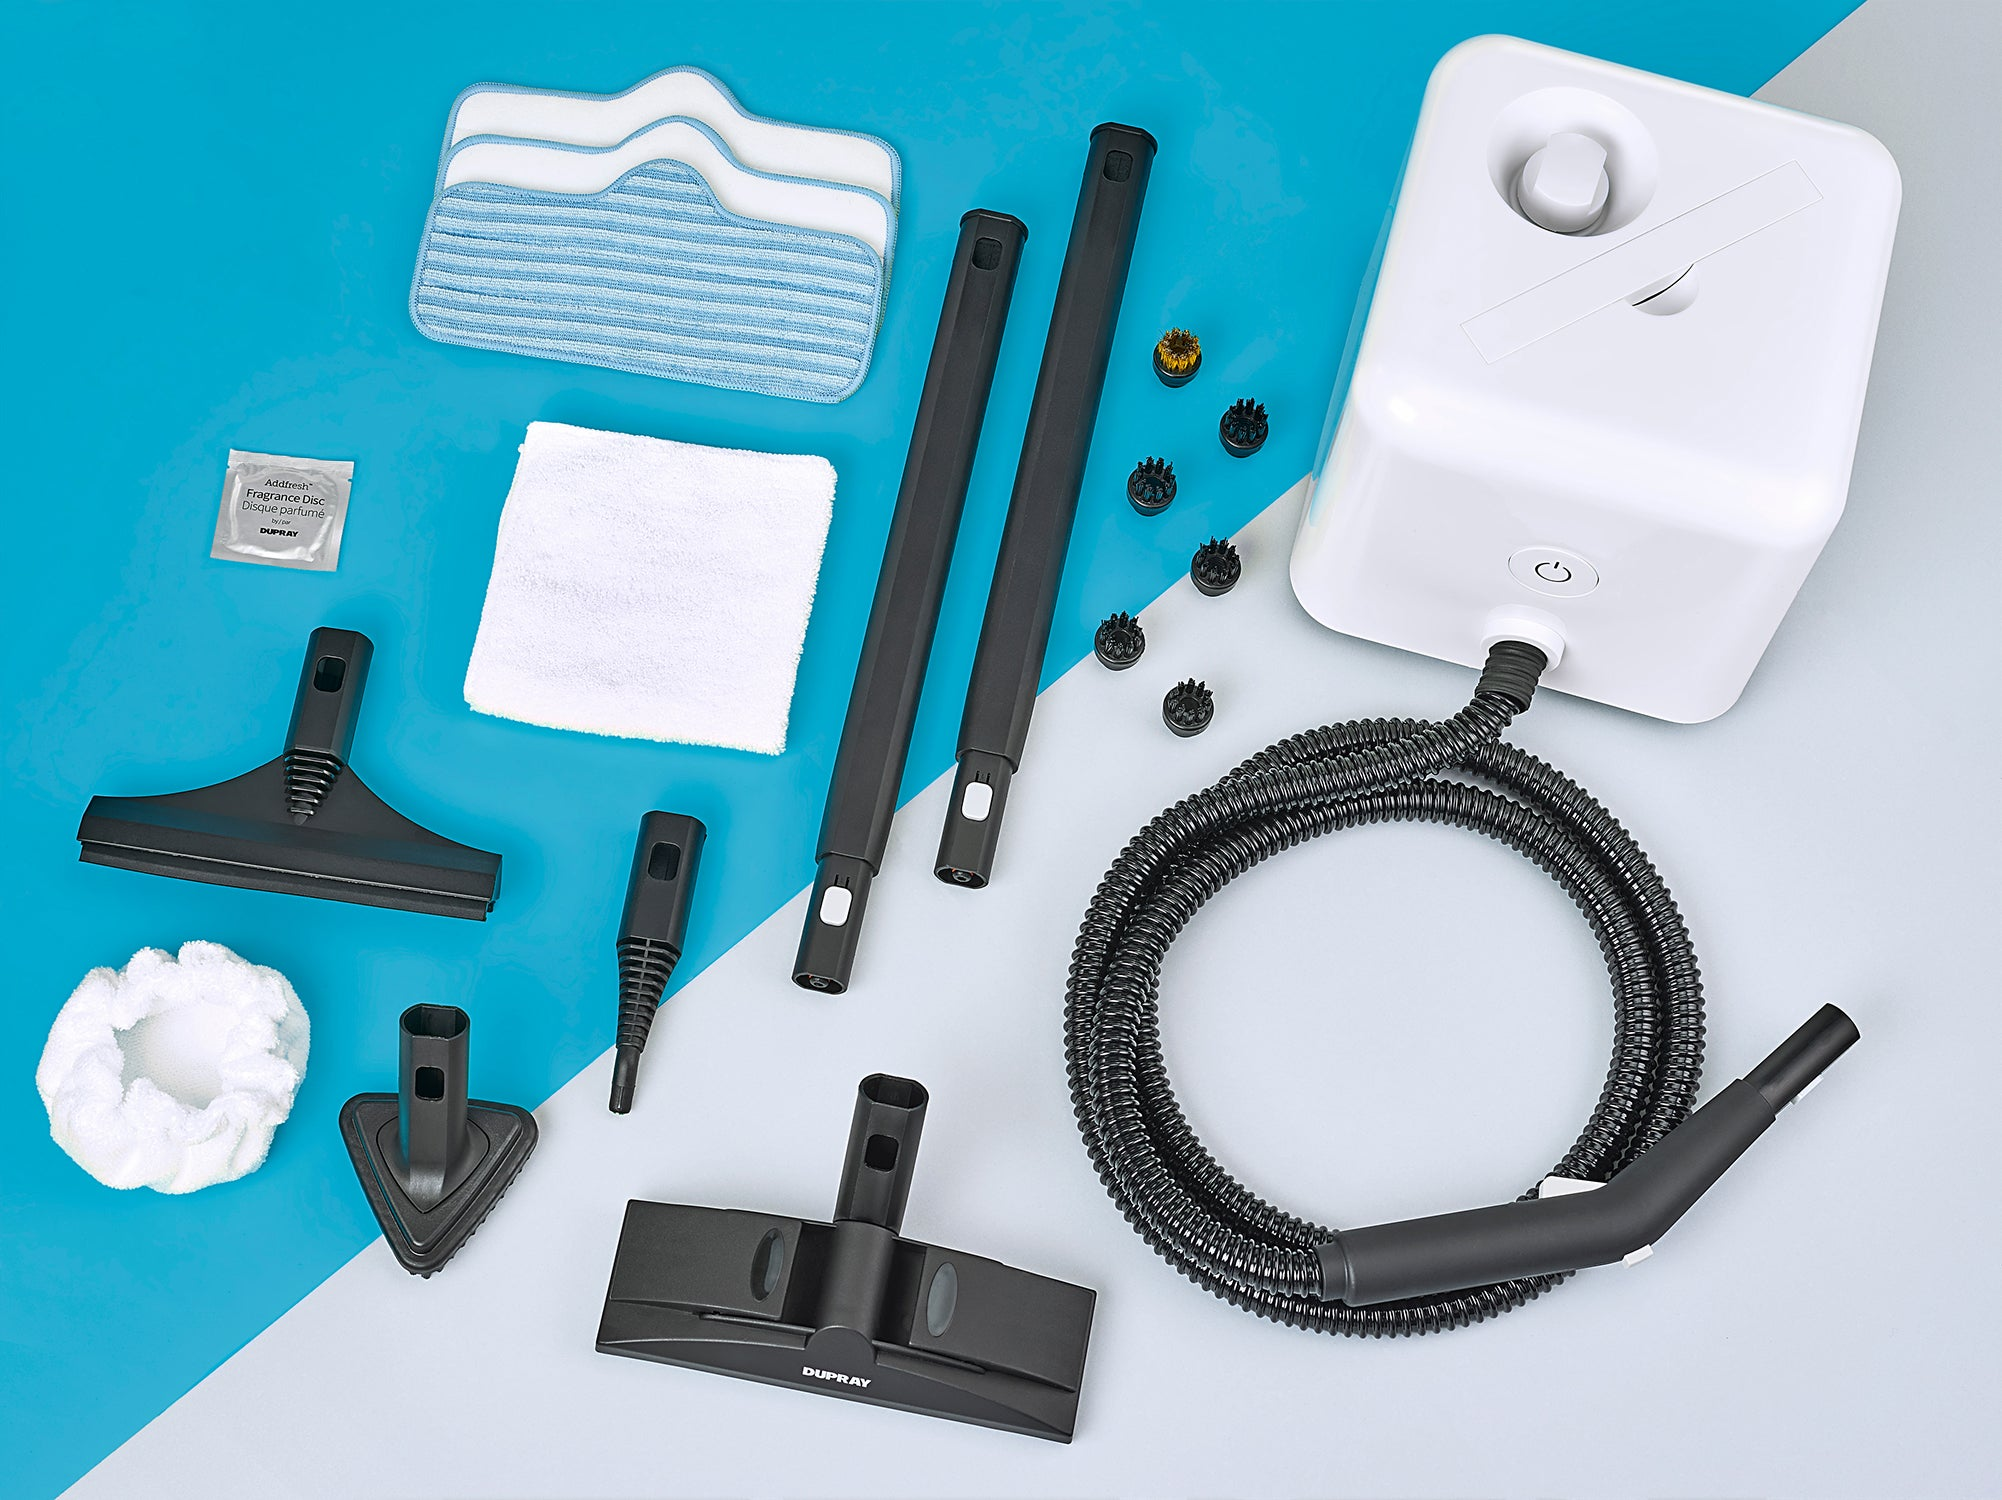 Dupray Neat Steam Cleaner accessories